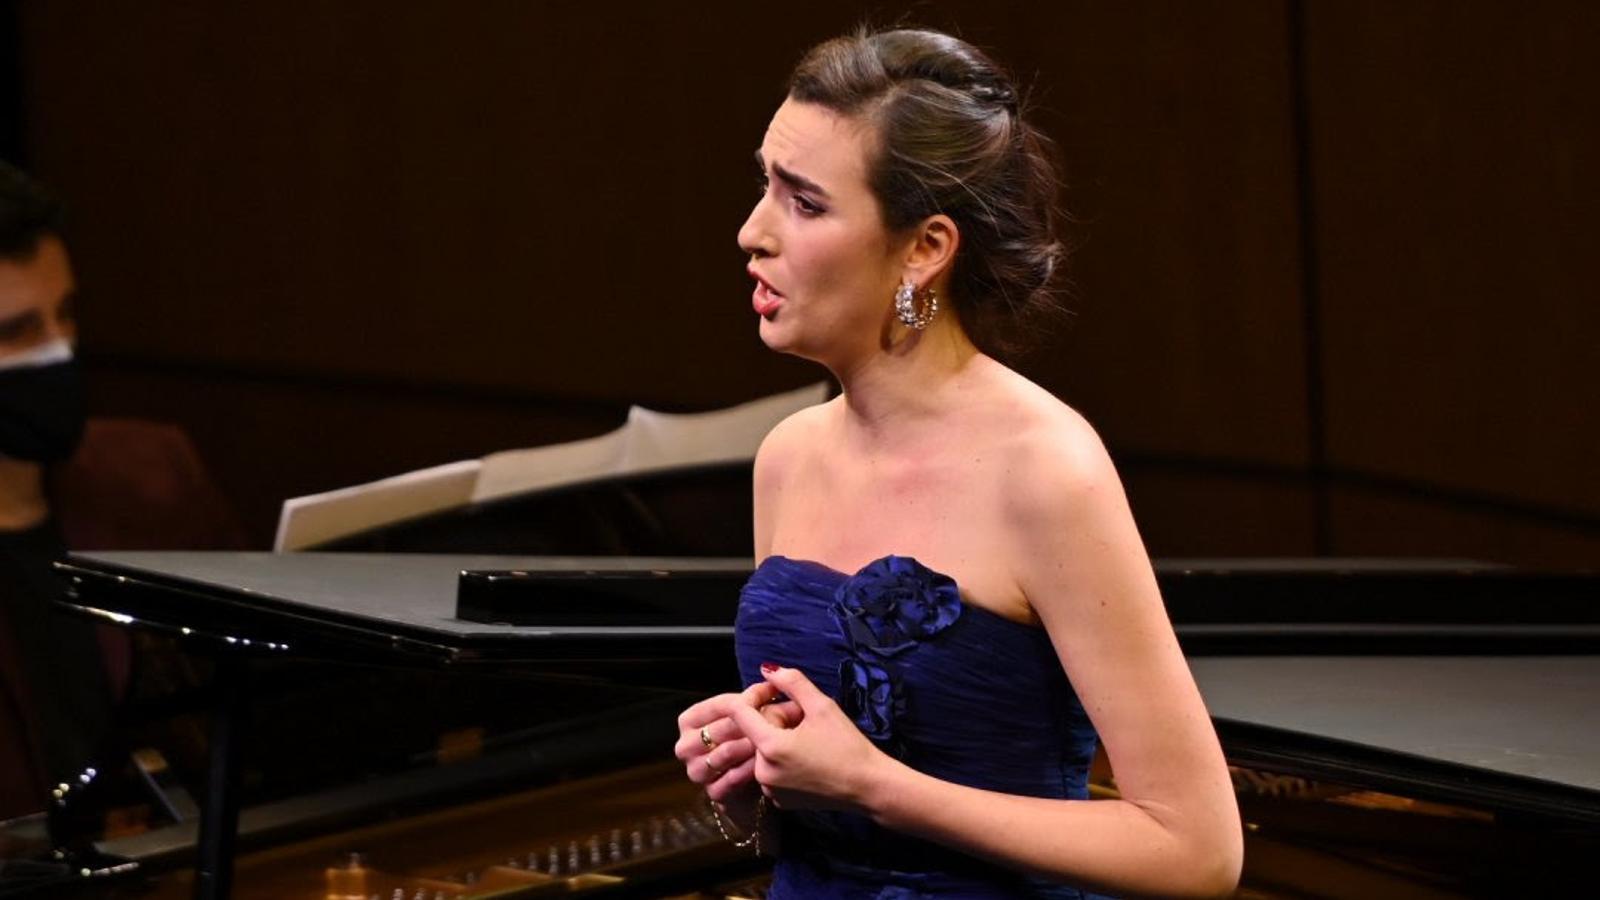 La mezzosoprano basca Carmen Artaza